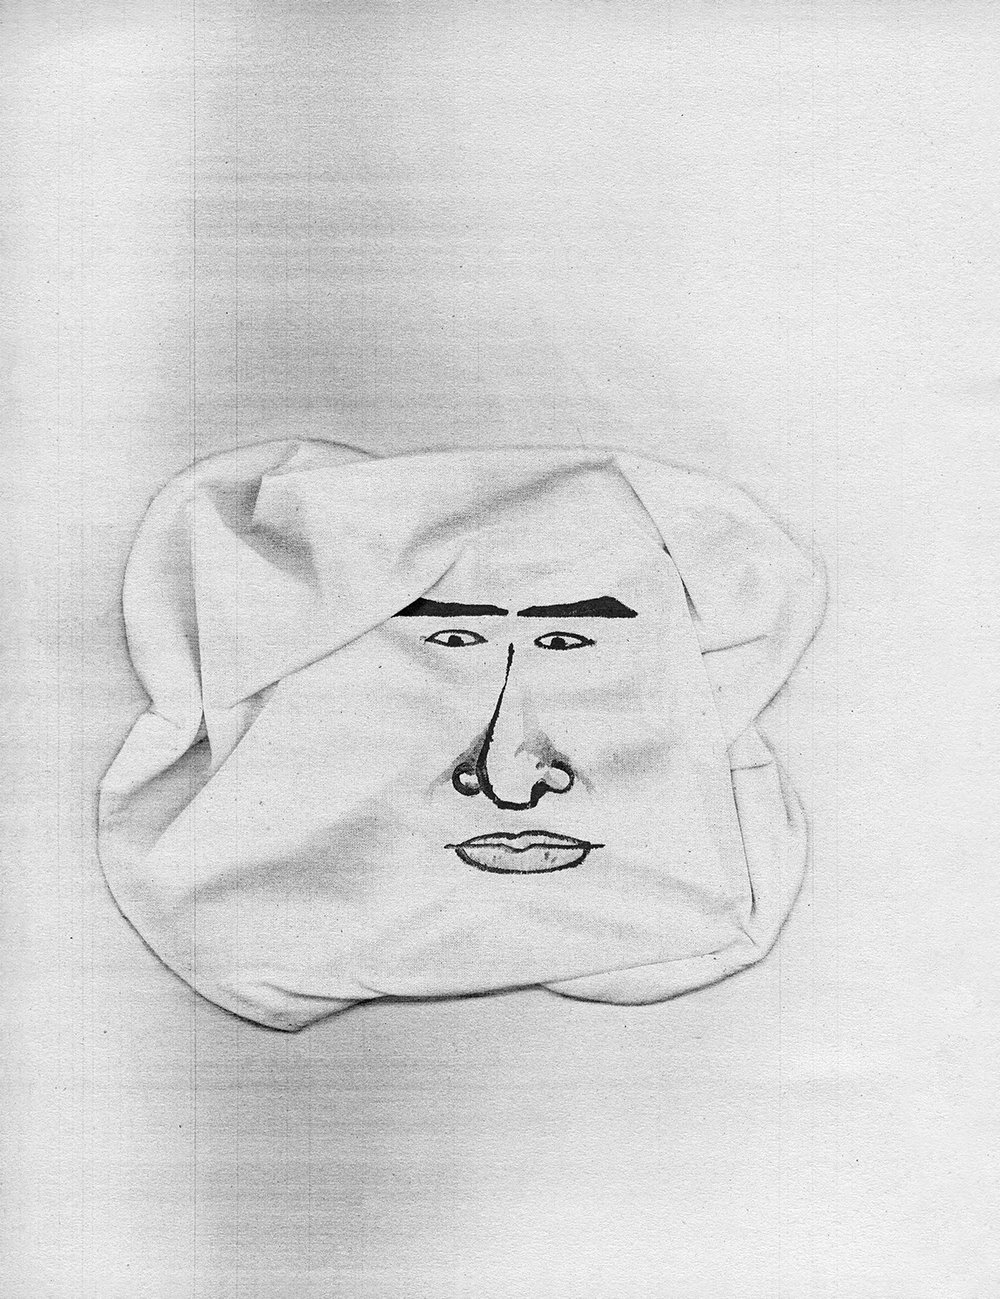 Human Imperfections - Mr. Big Head 3